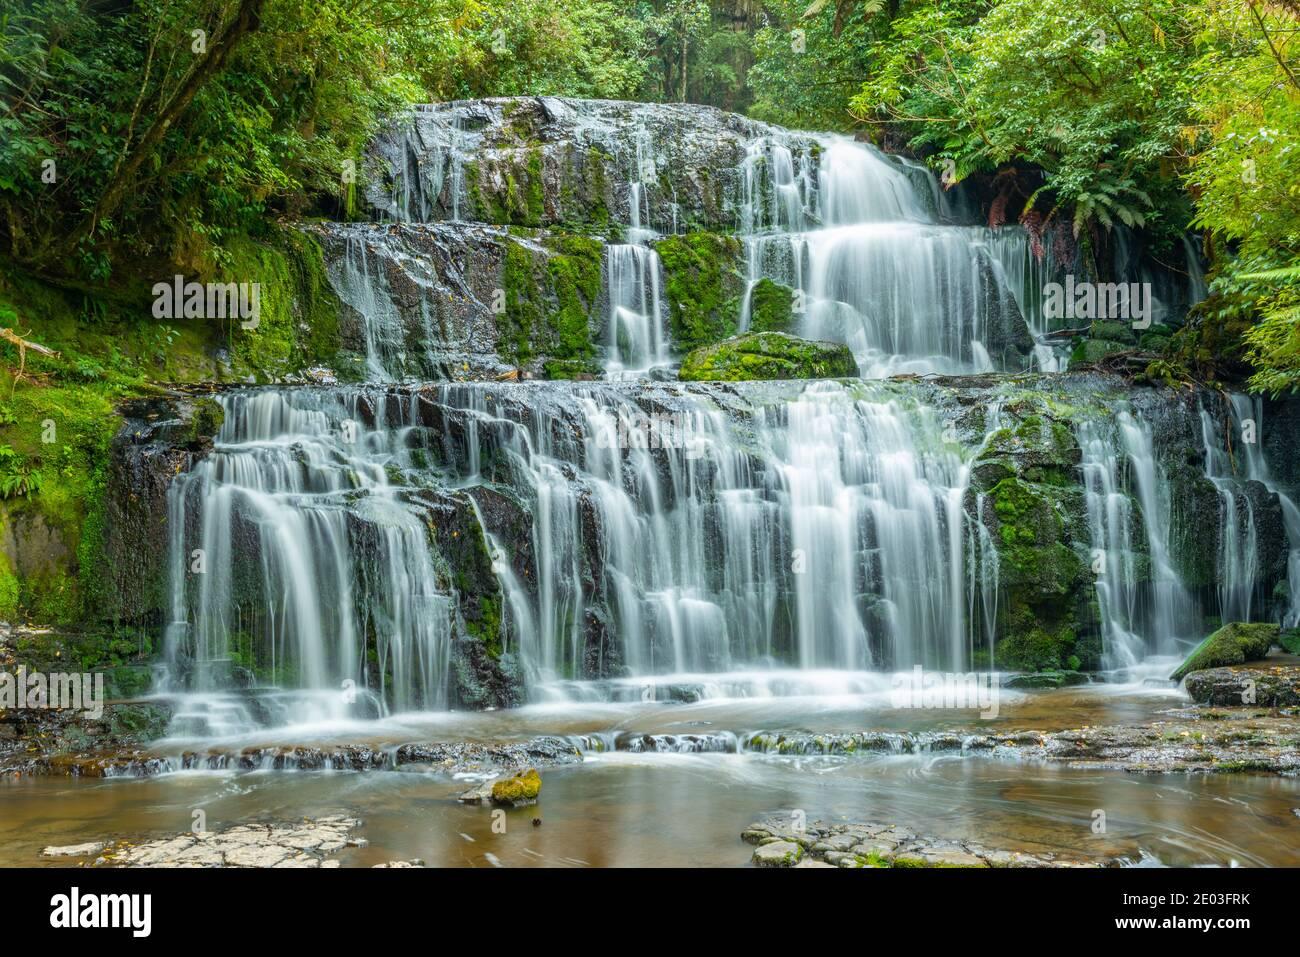 Purakaunui Falls at the Catlins region of New Zealand Stock Photo